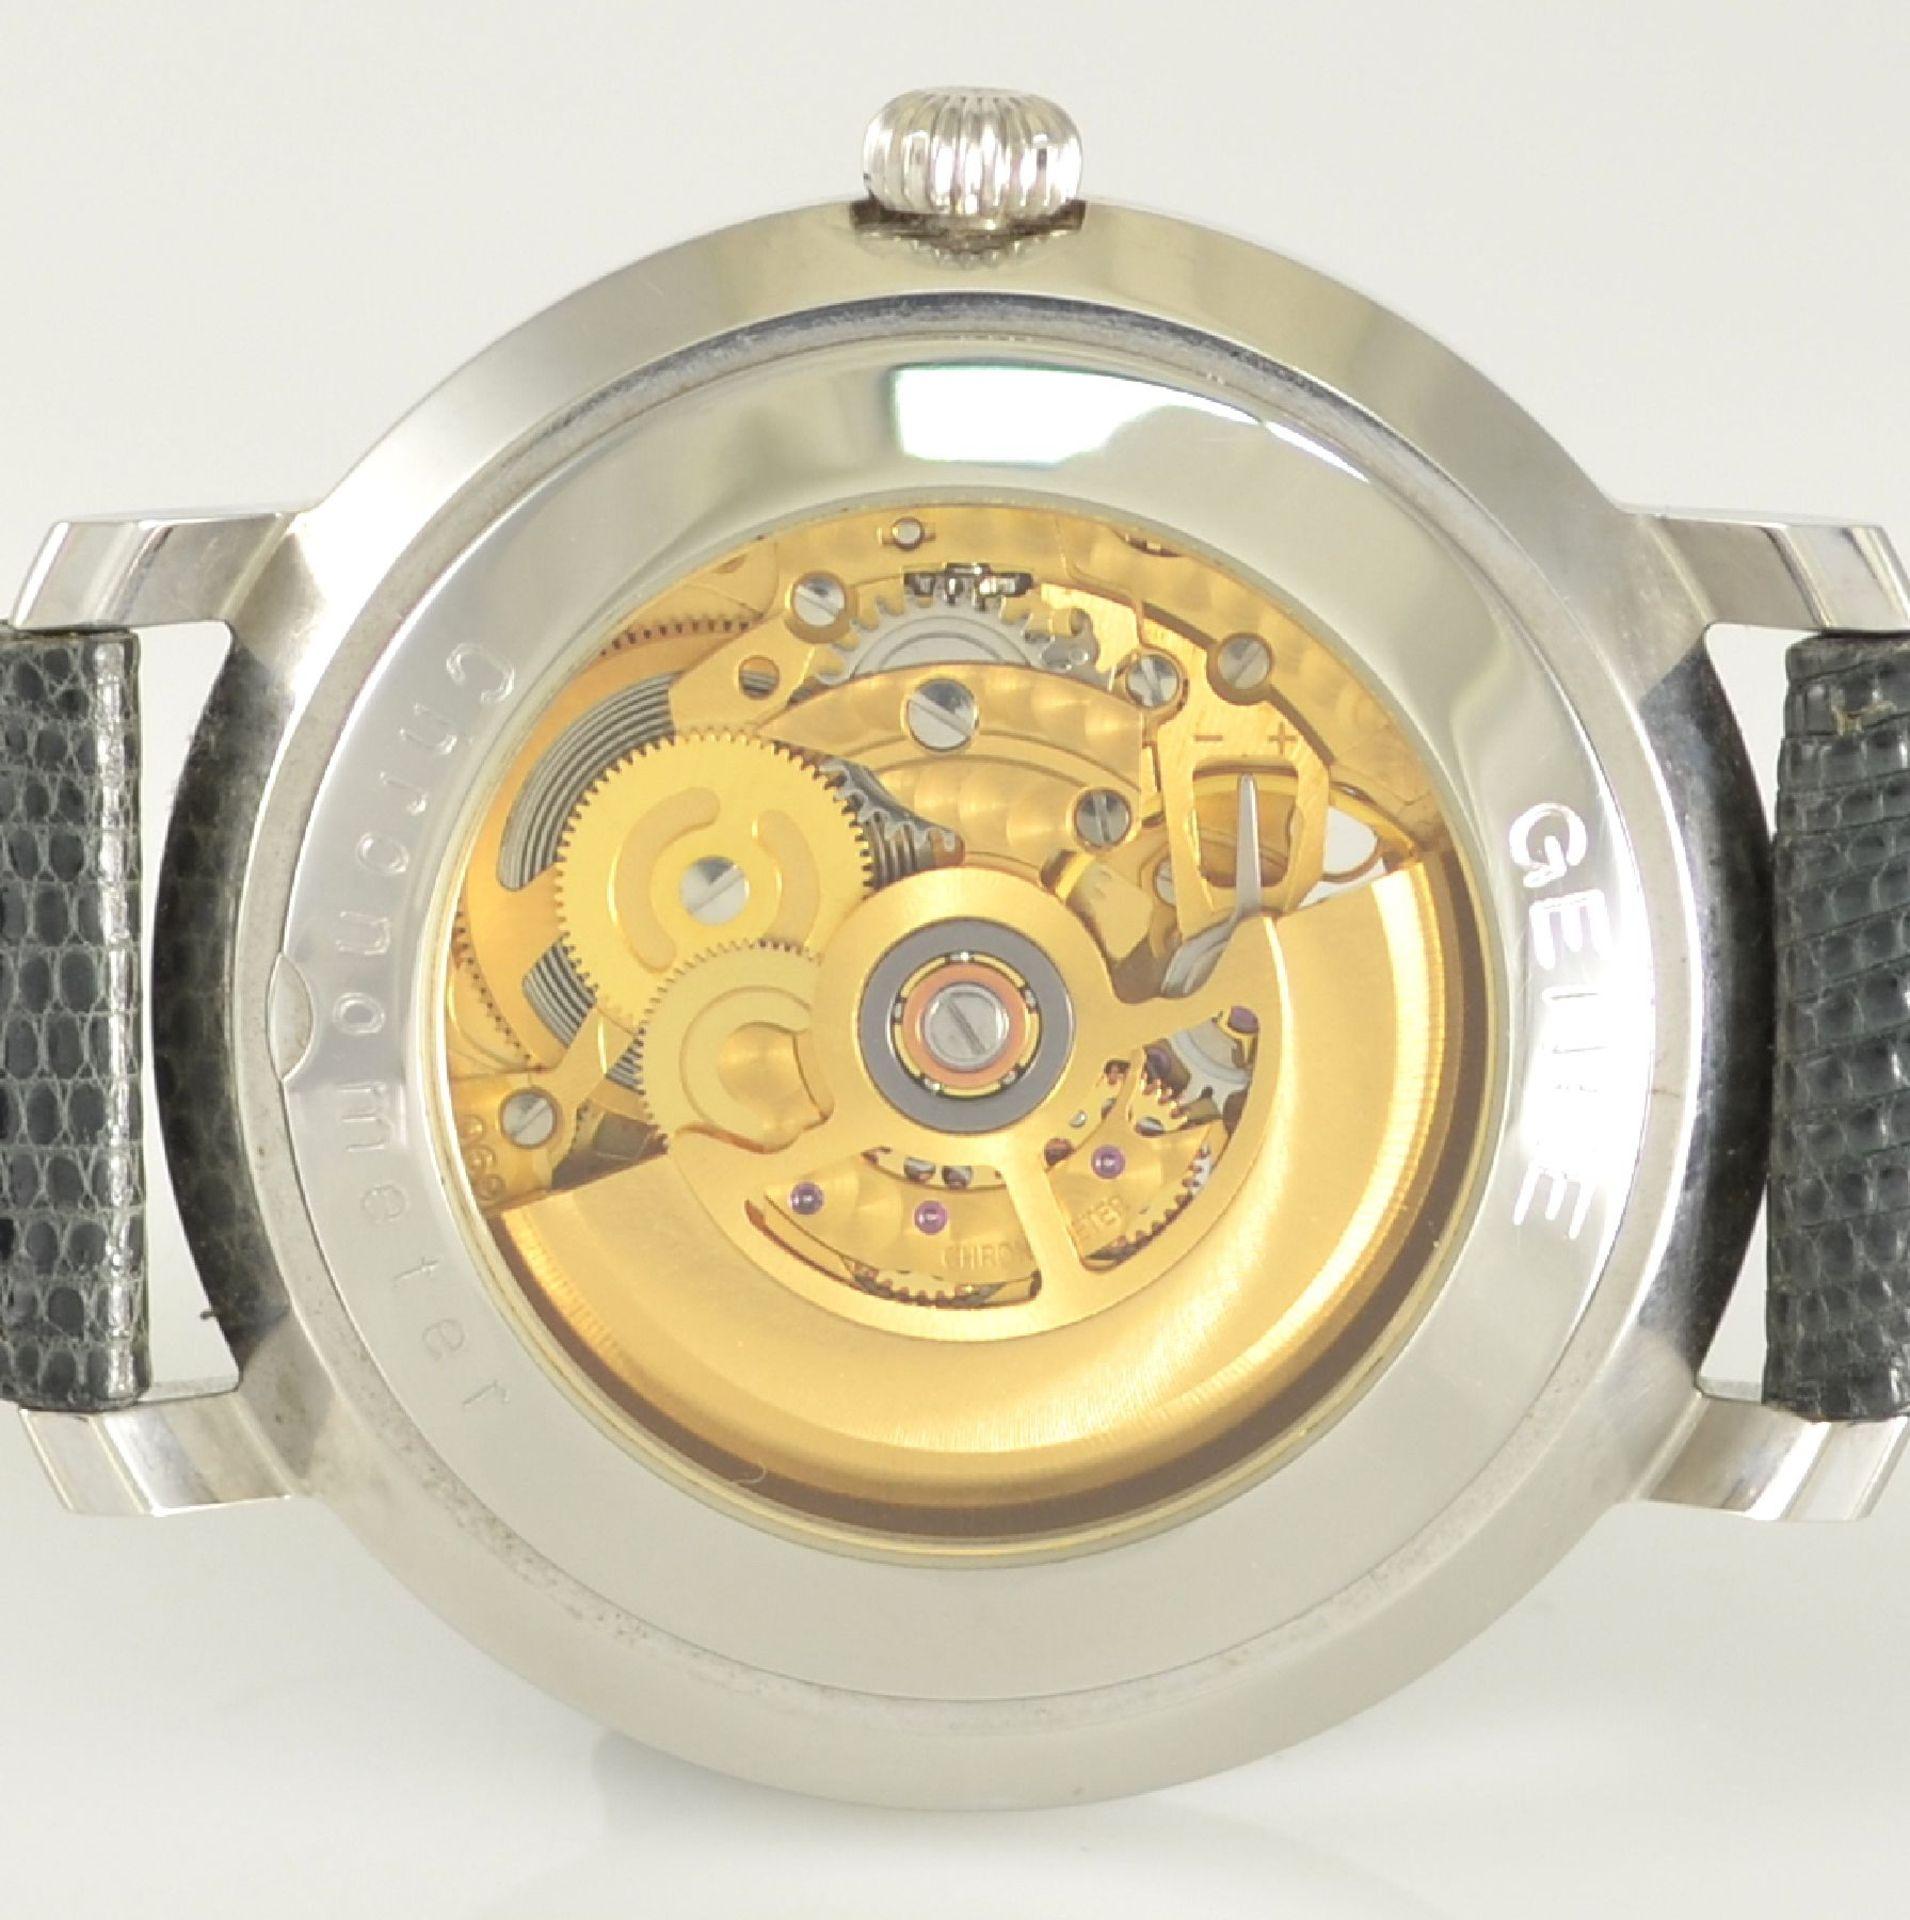 GENÉE No. 29 Chronometer-Herrenarmbanduhr in Stahl, Schweiz lt. beiliegendem Chronometerzertifikat - Bild 6 aus 8